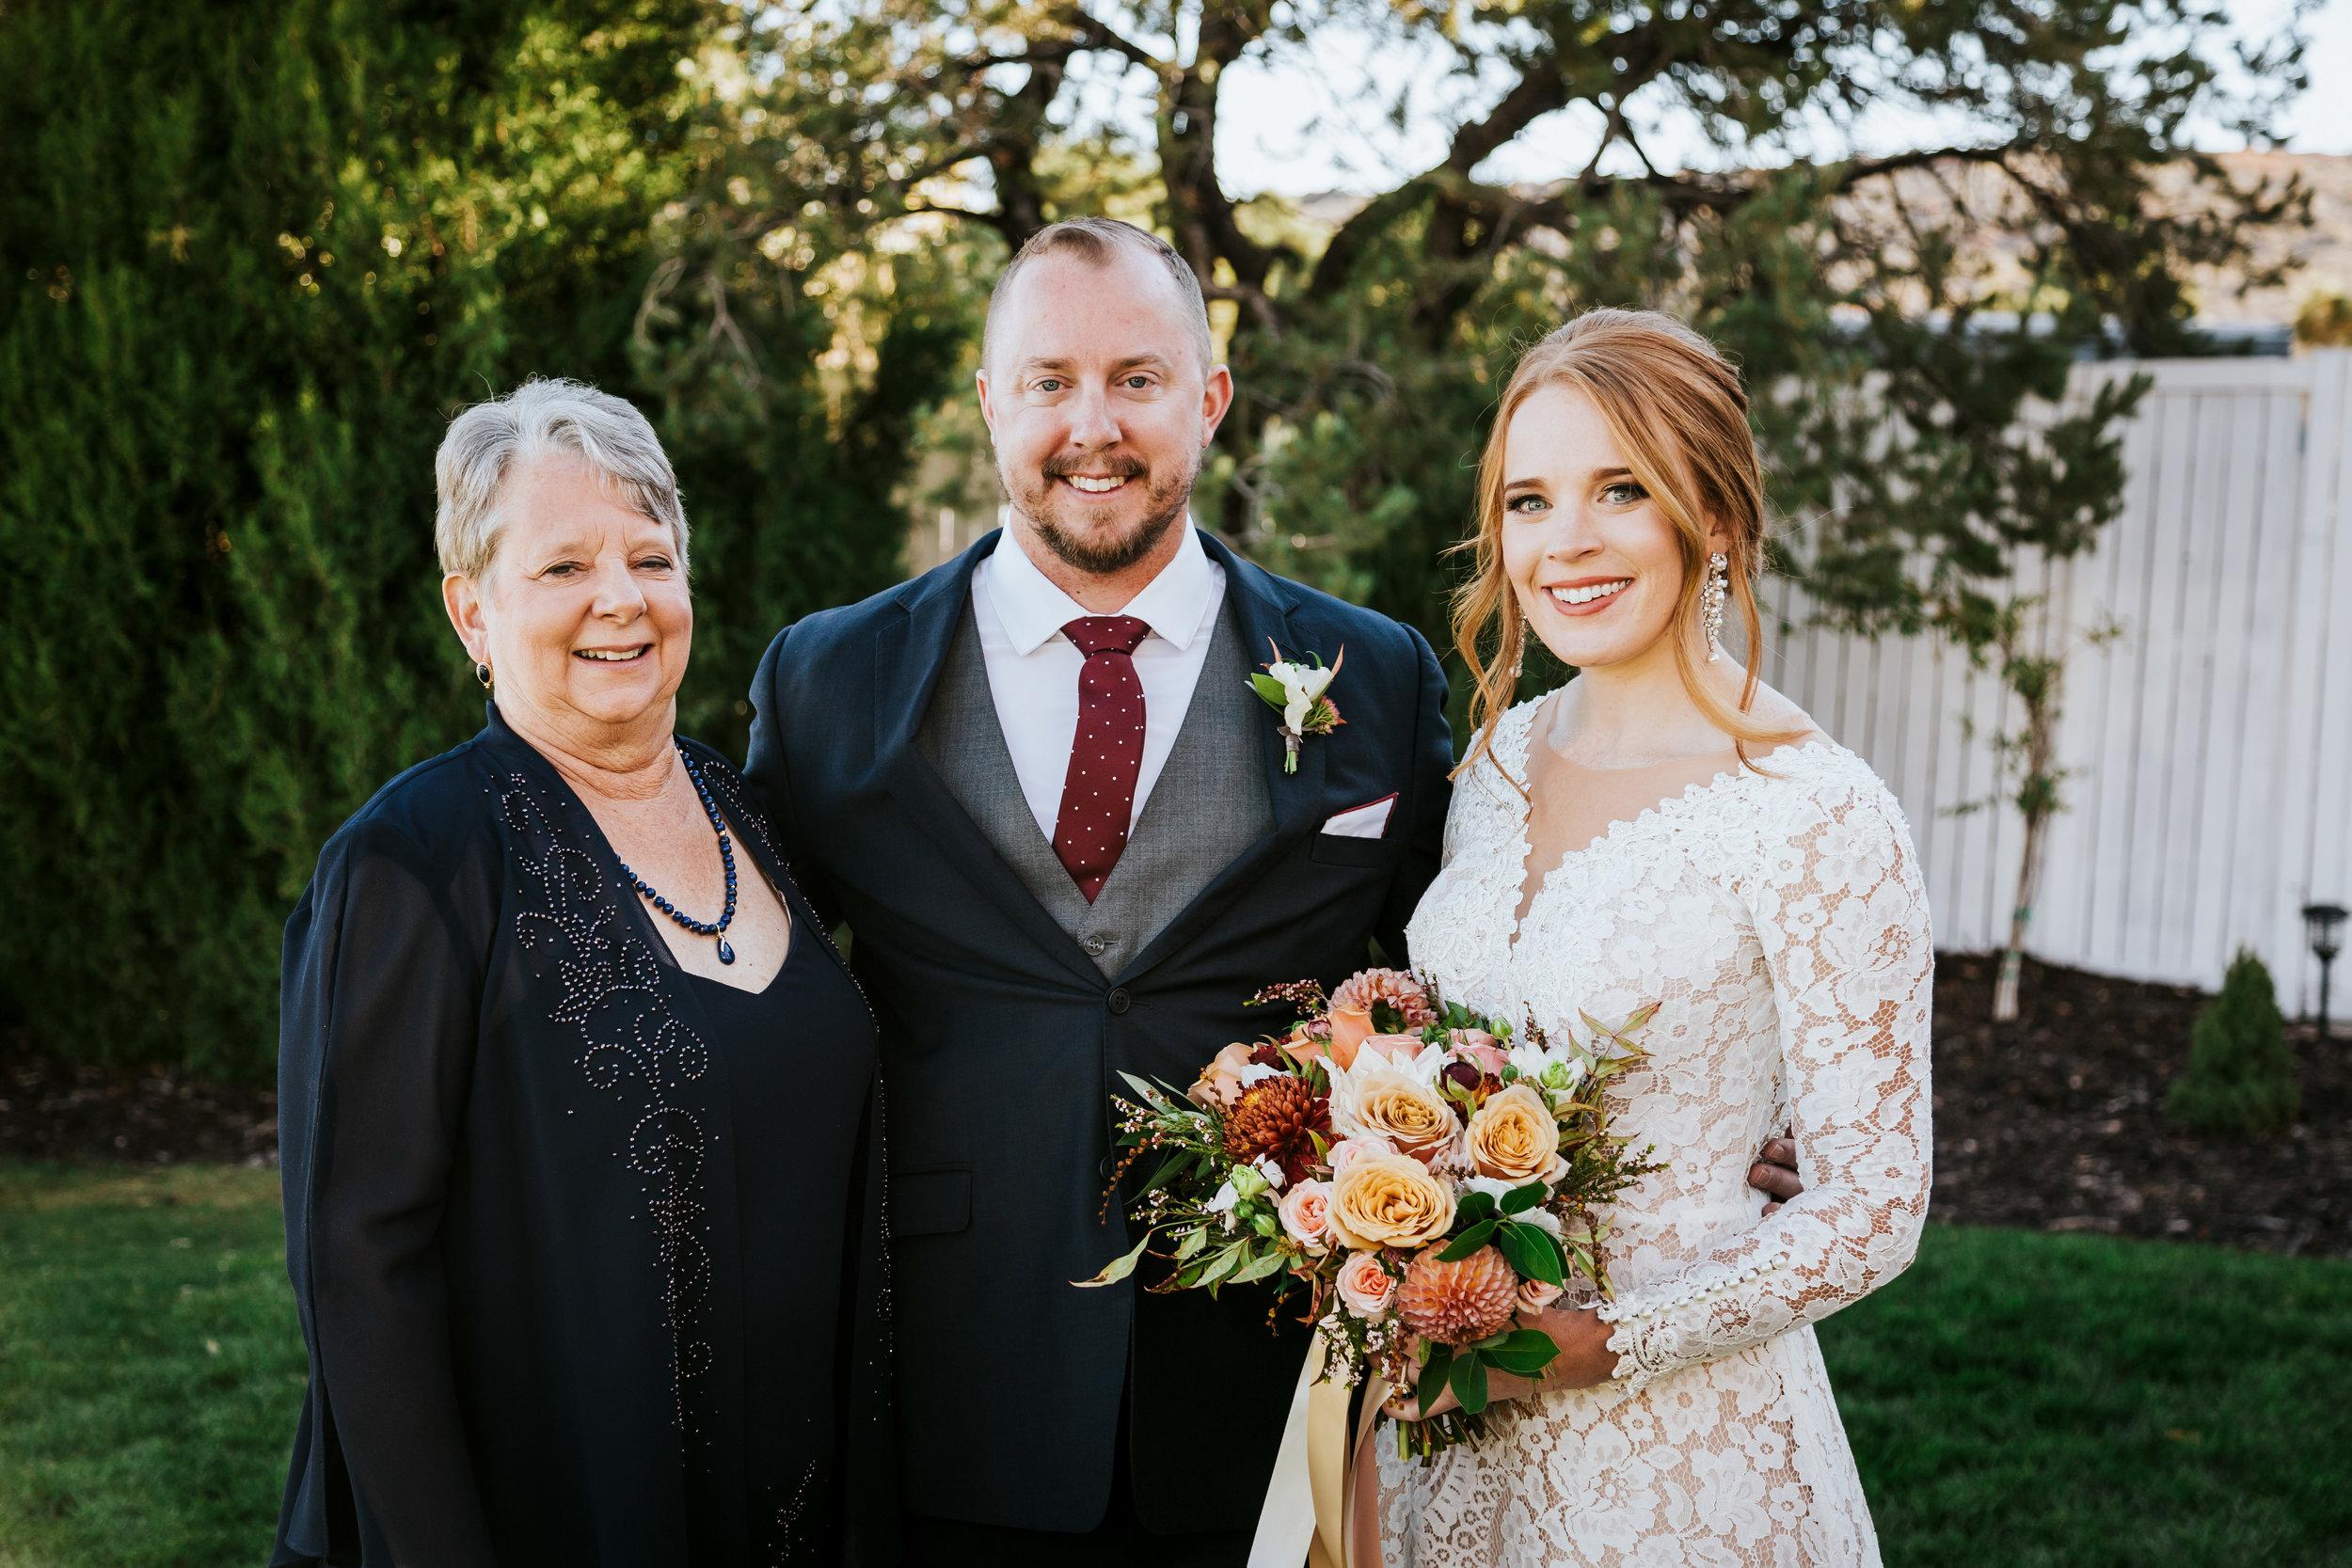 Laura Brett Denver Wedding Manor House Group Photos-106.JPG